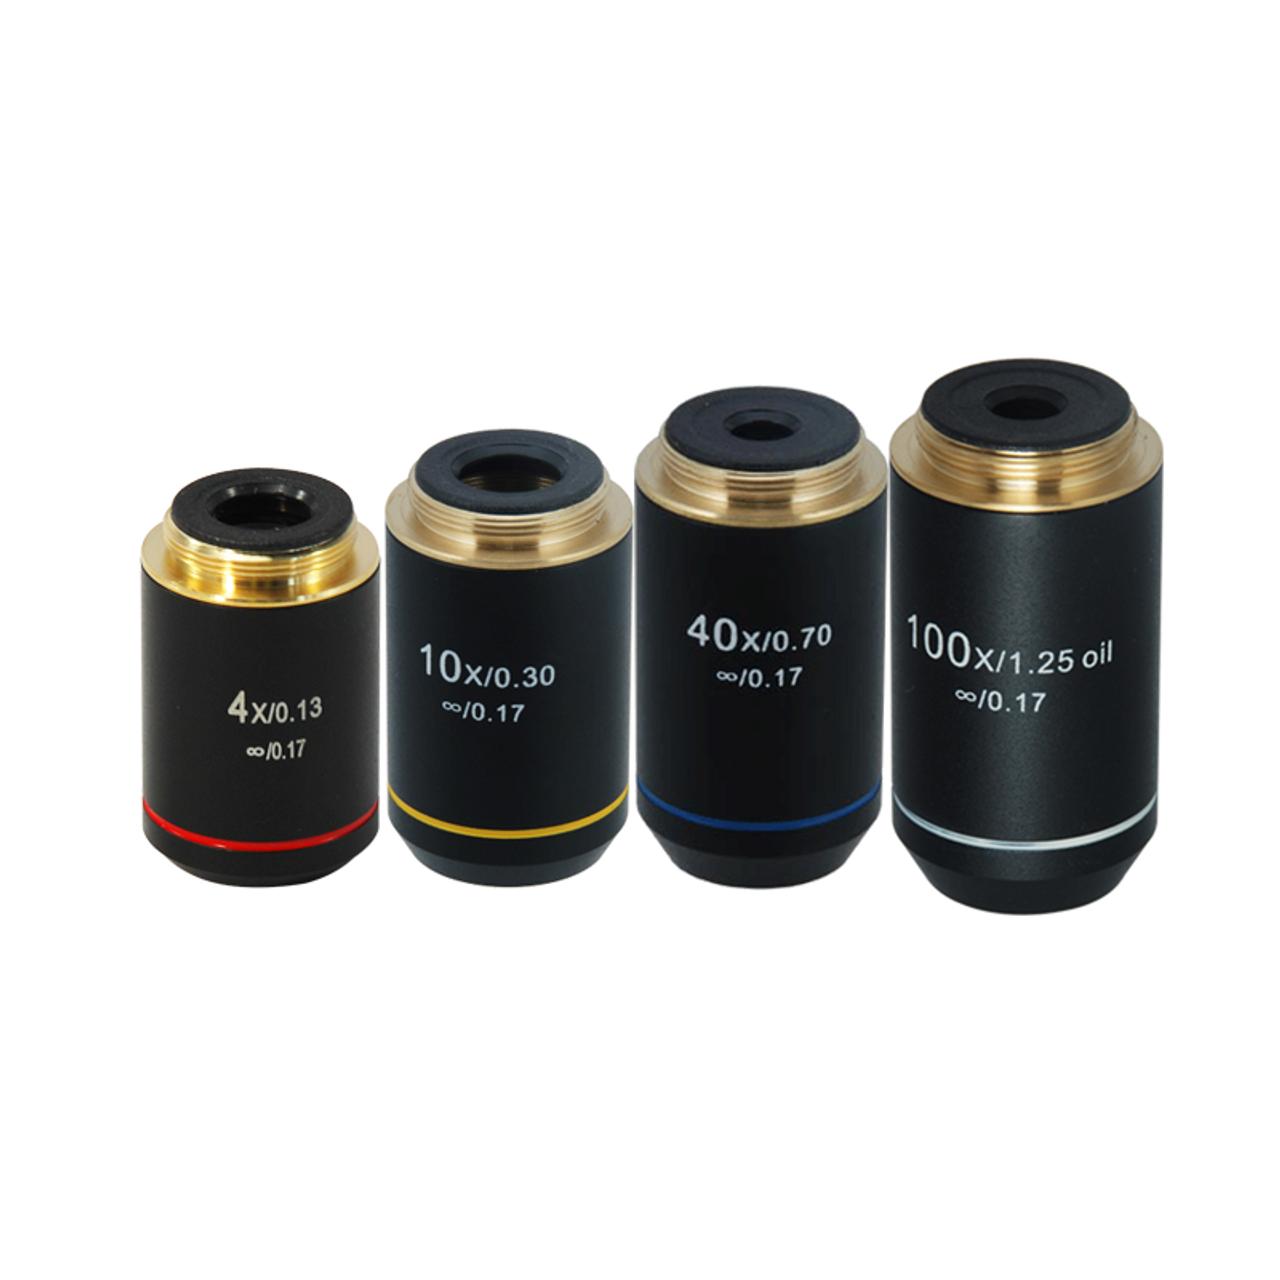 Oil Spring 4X 10X 40X 100X BM04013011 BoliOptics Achromatic Microscope Objective Lens Set